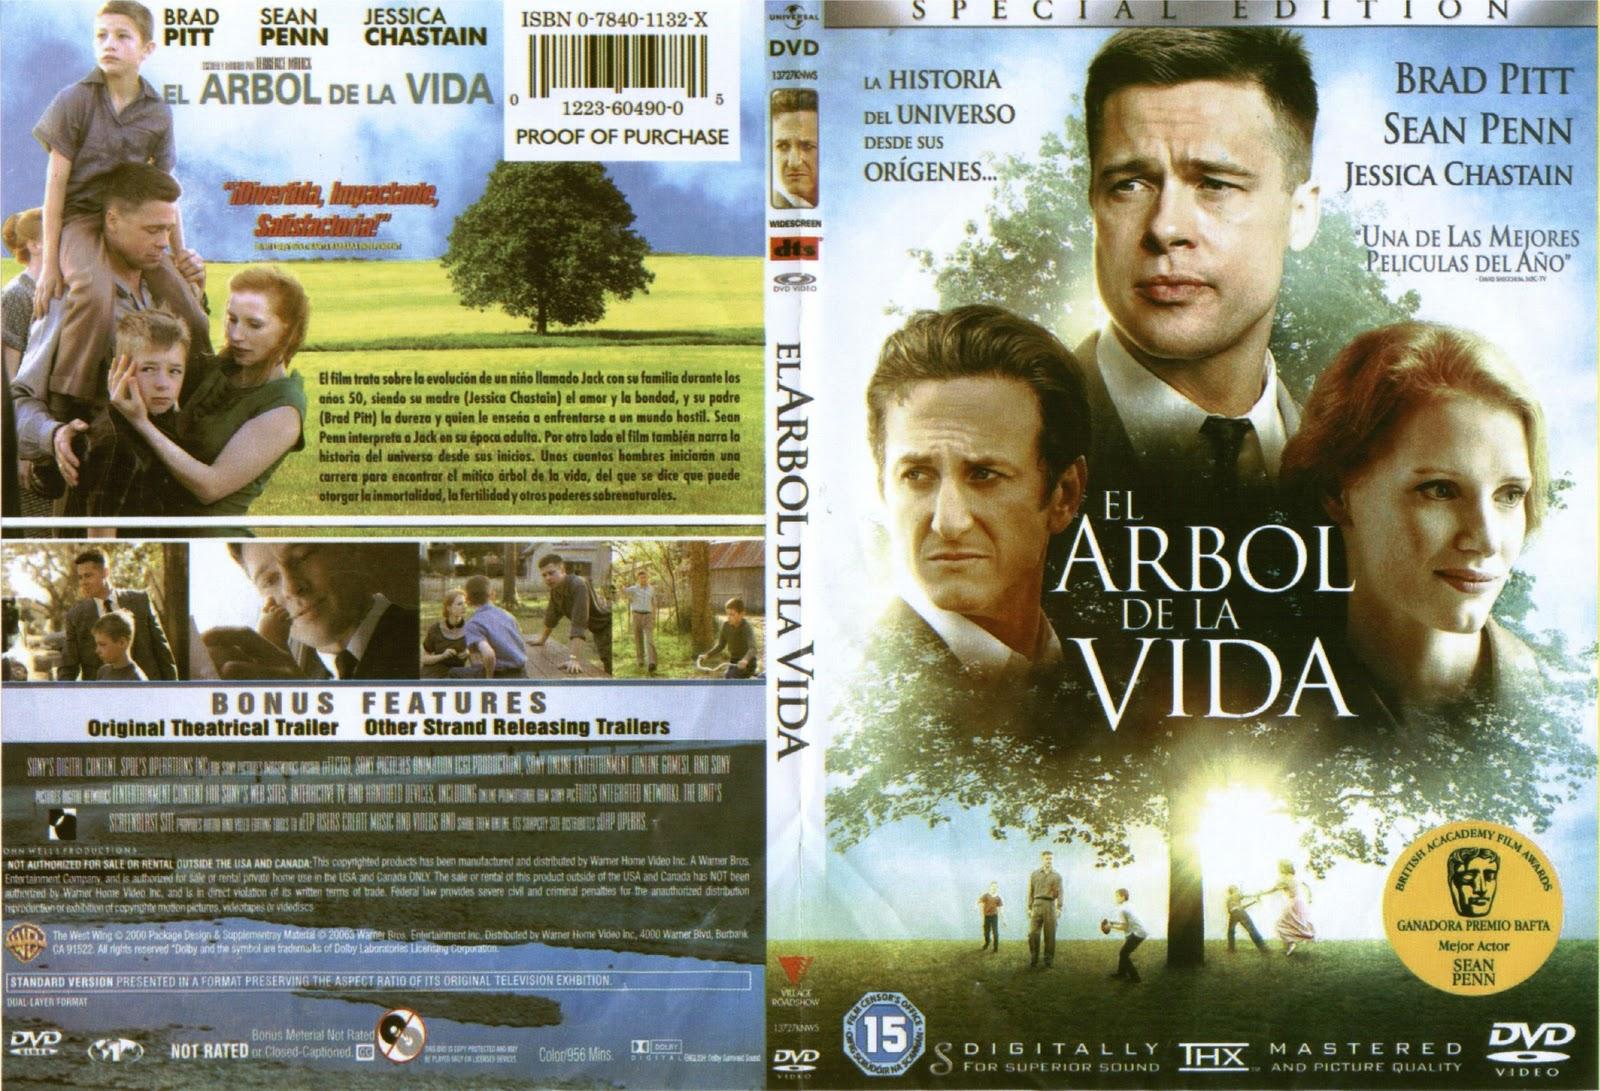 http://4.bp.blogspot.com/-mI0WoNPOu3U/TnxsaFKQ9xI/AAAAAAAAAhM/xd0lrJRhJME/s1600/El_Arbol_De_La_Vida_-_2011_-_Custom_por_magna_%255Bdvd%255D_80.jpg